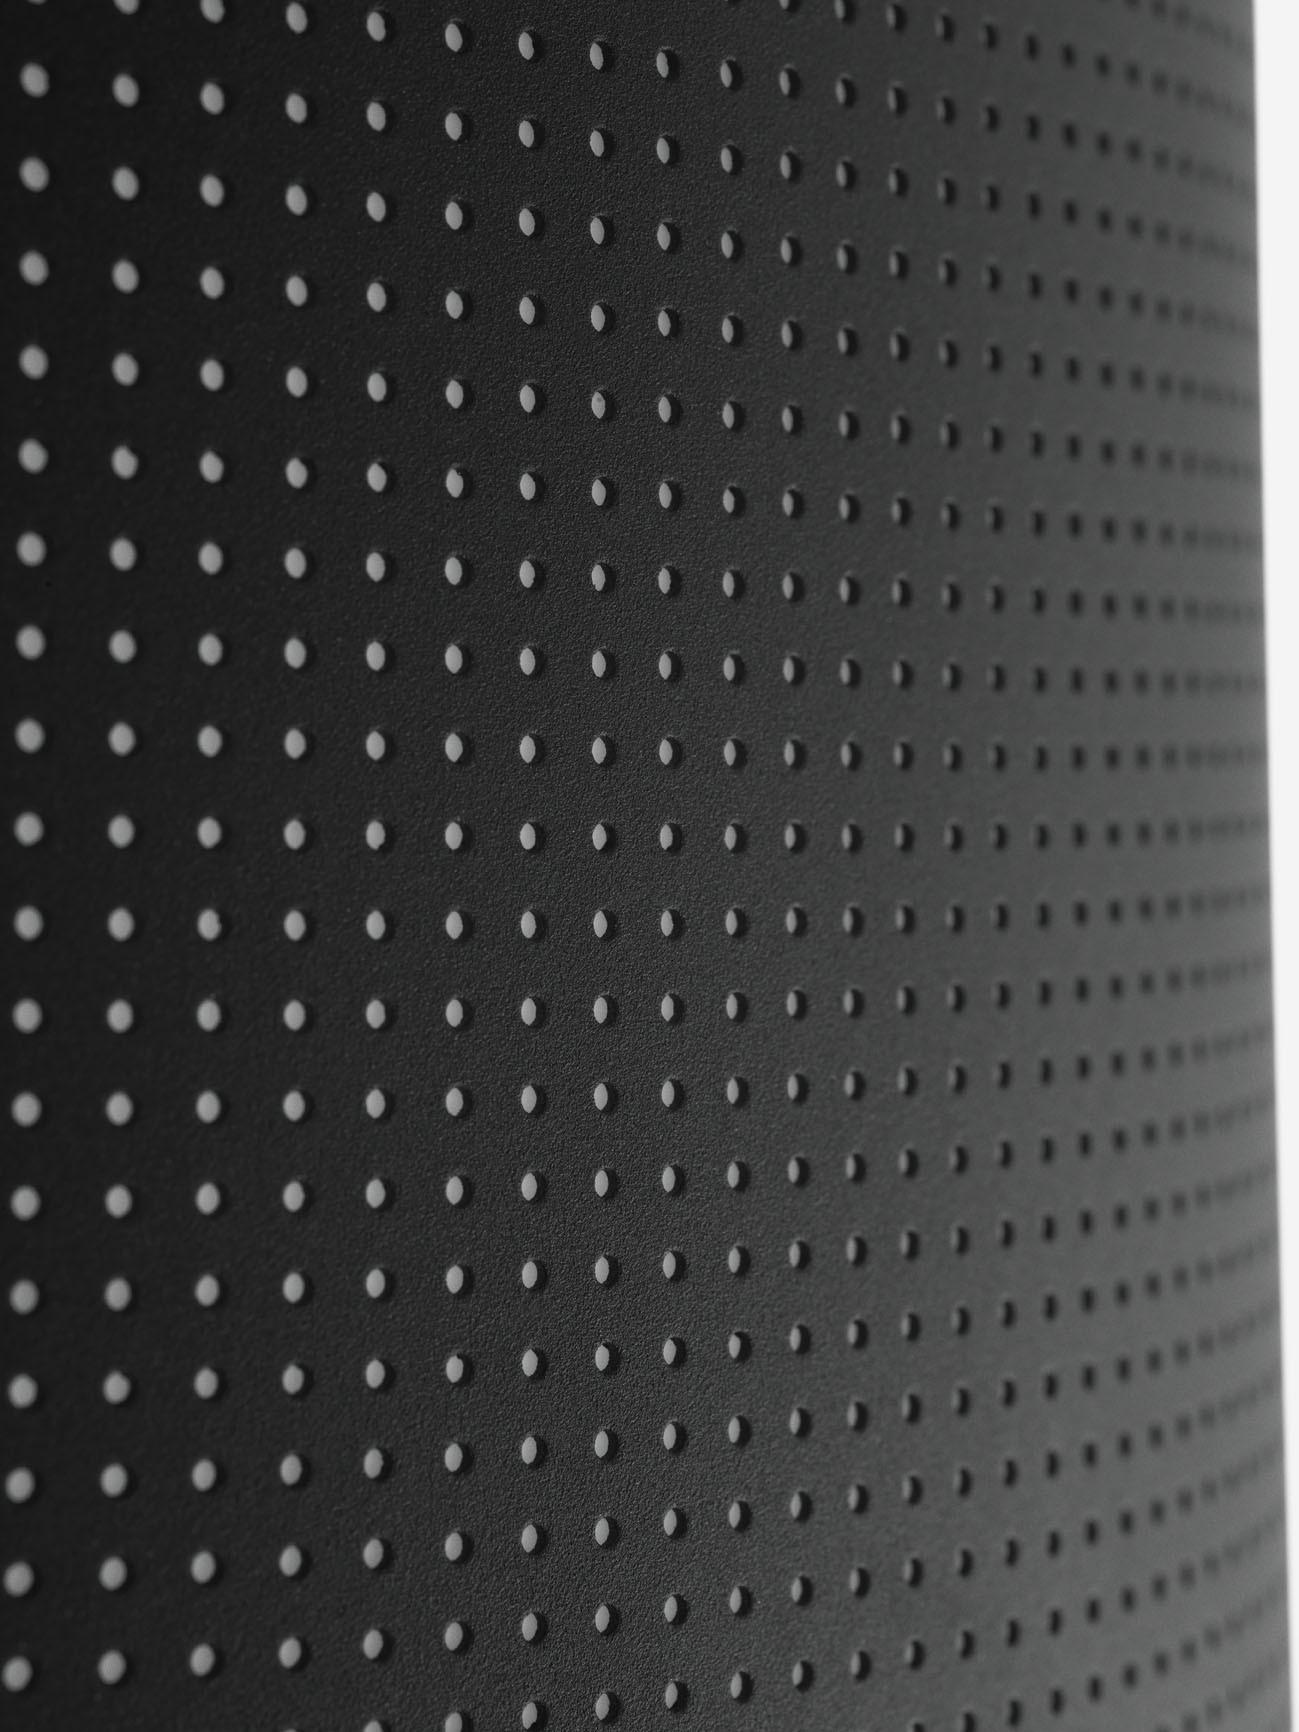 vipp Wall Spot Black VIPP524, 52404EU, 5705953004765